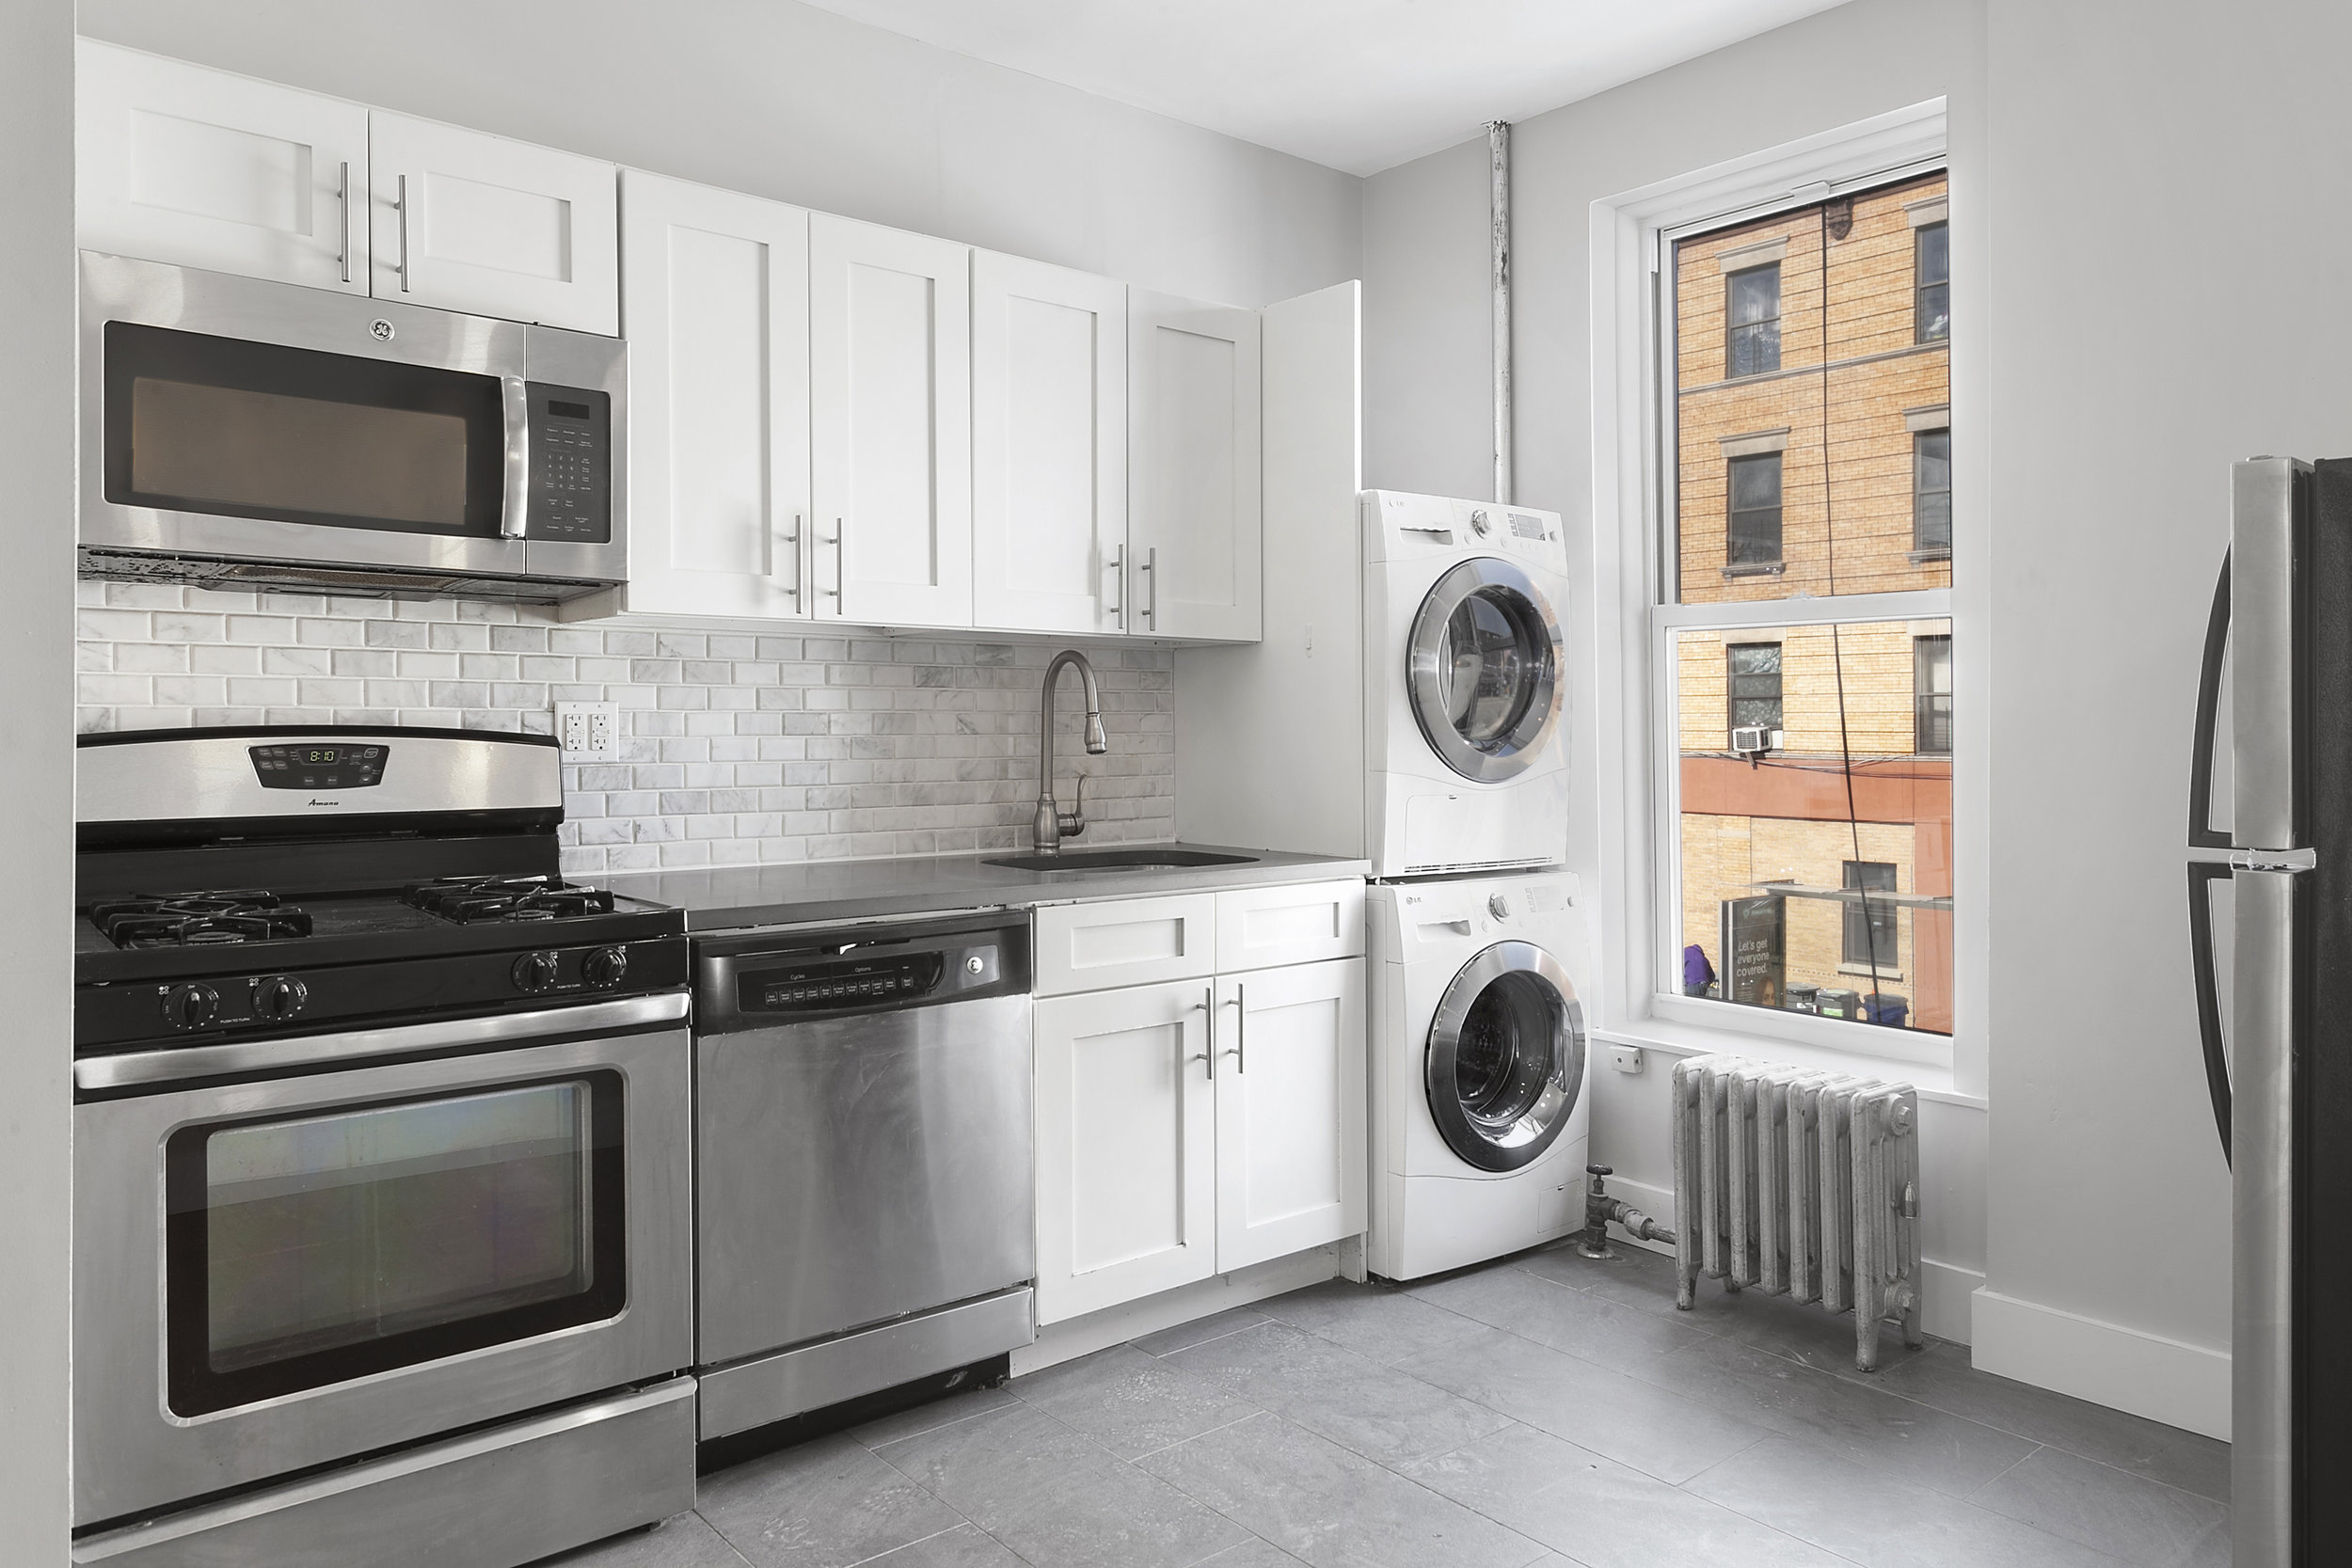 615 halsey street kitchen apt 1F.jpg